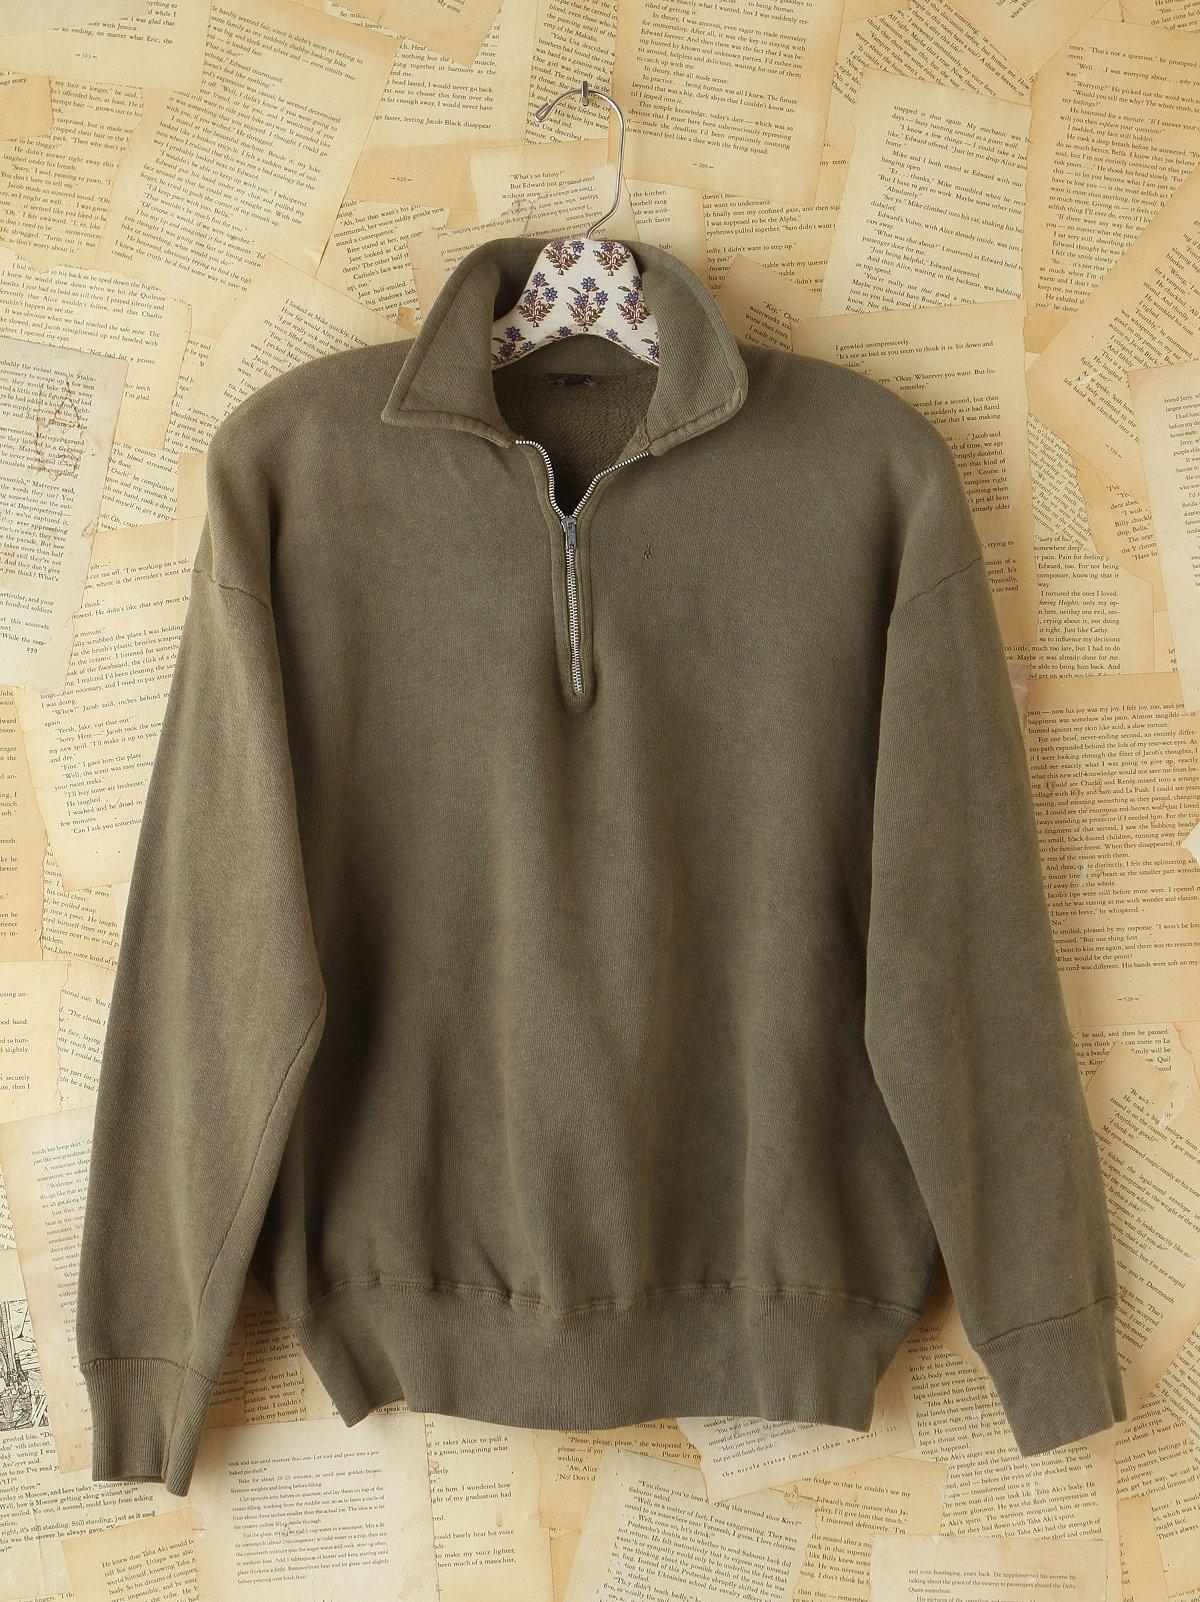 Vintage 1950s Green Sweatshirt